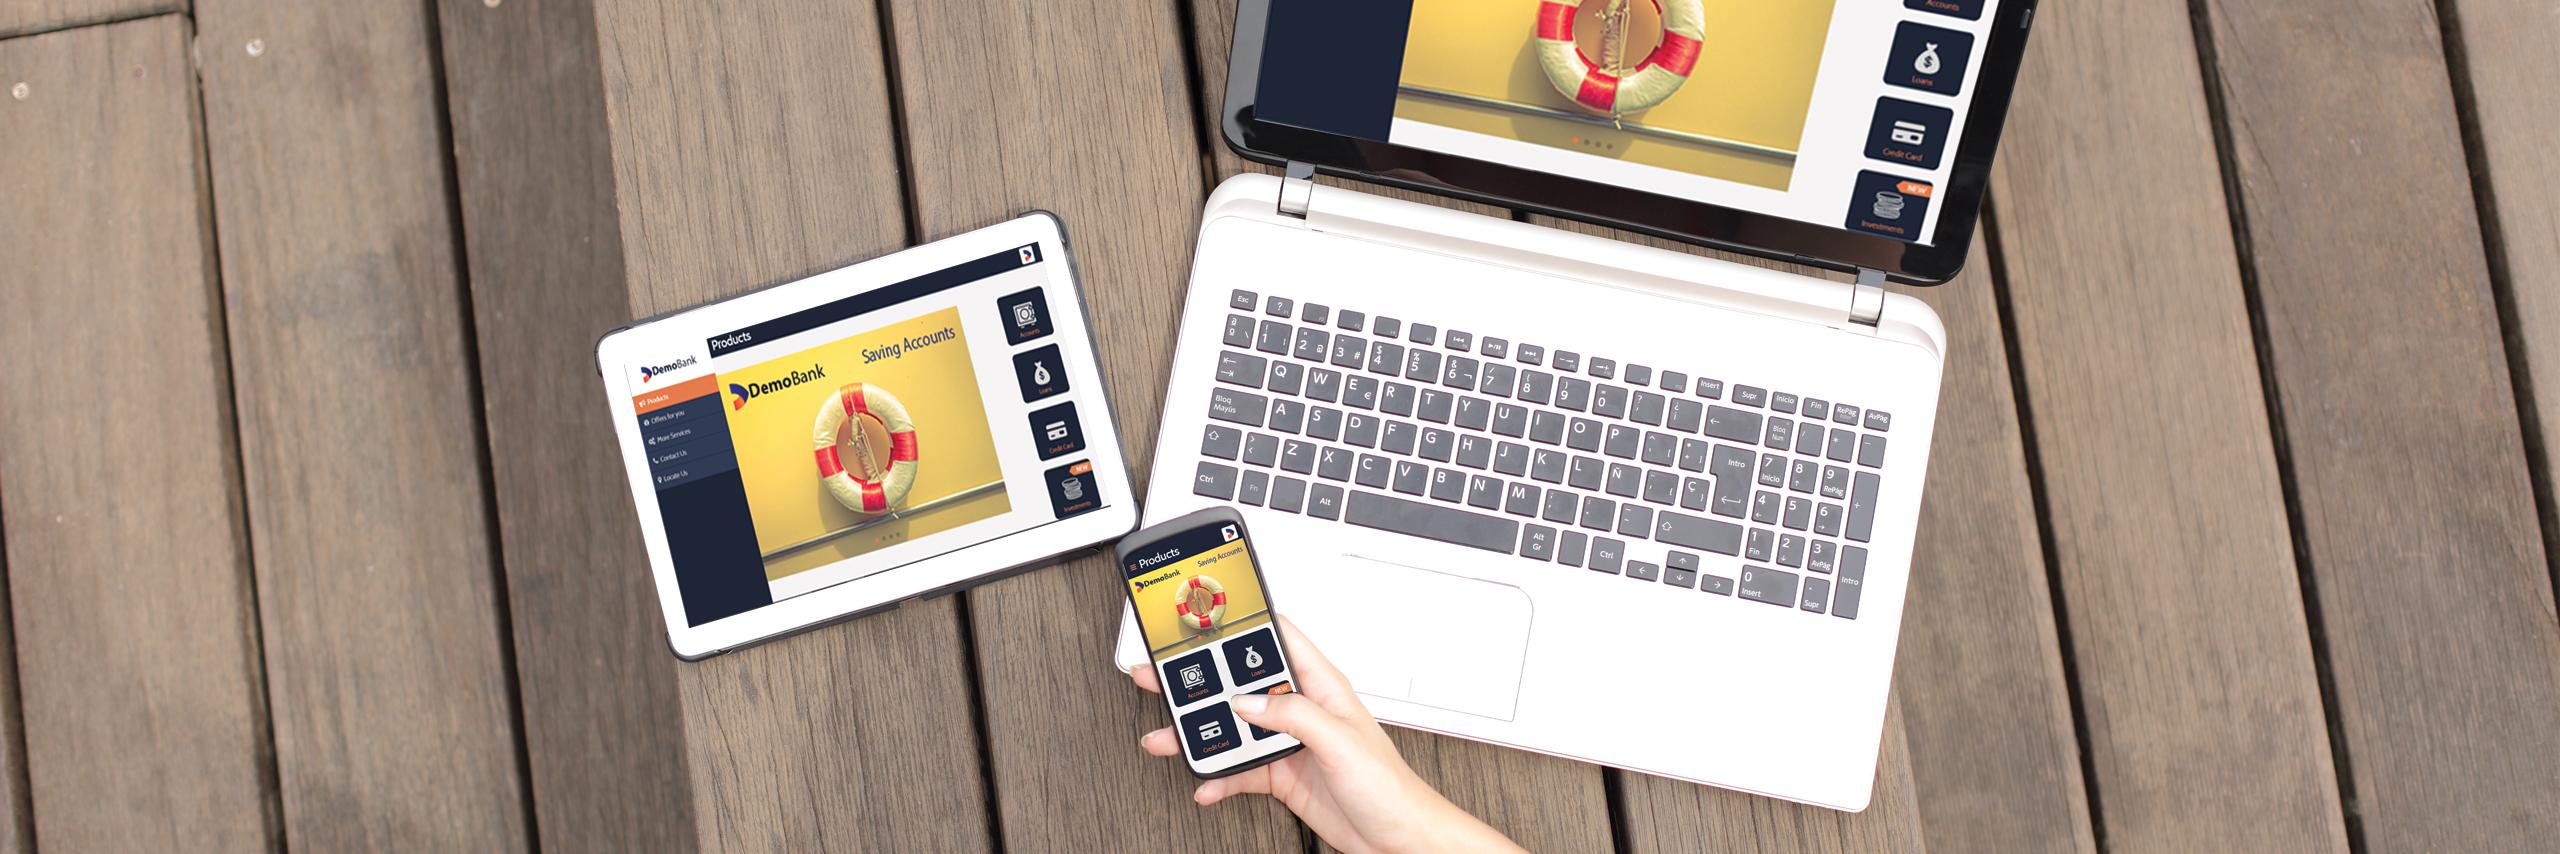 Clayfin - Customer Experience Platform